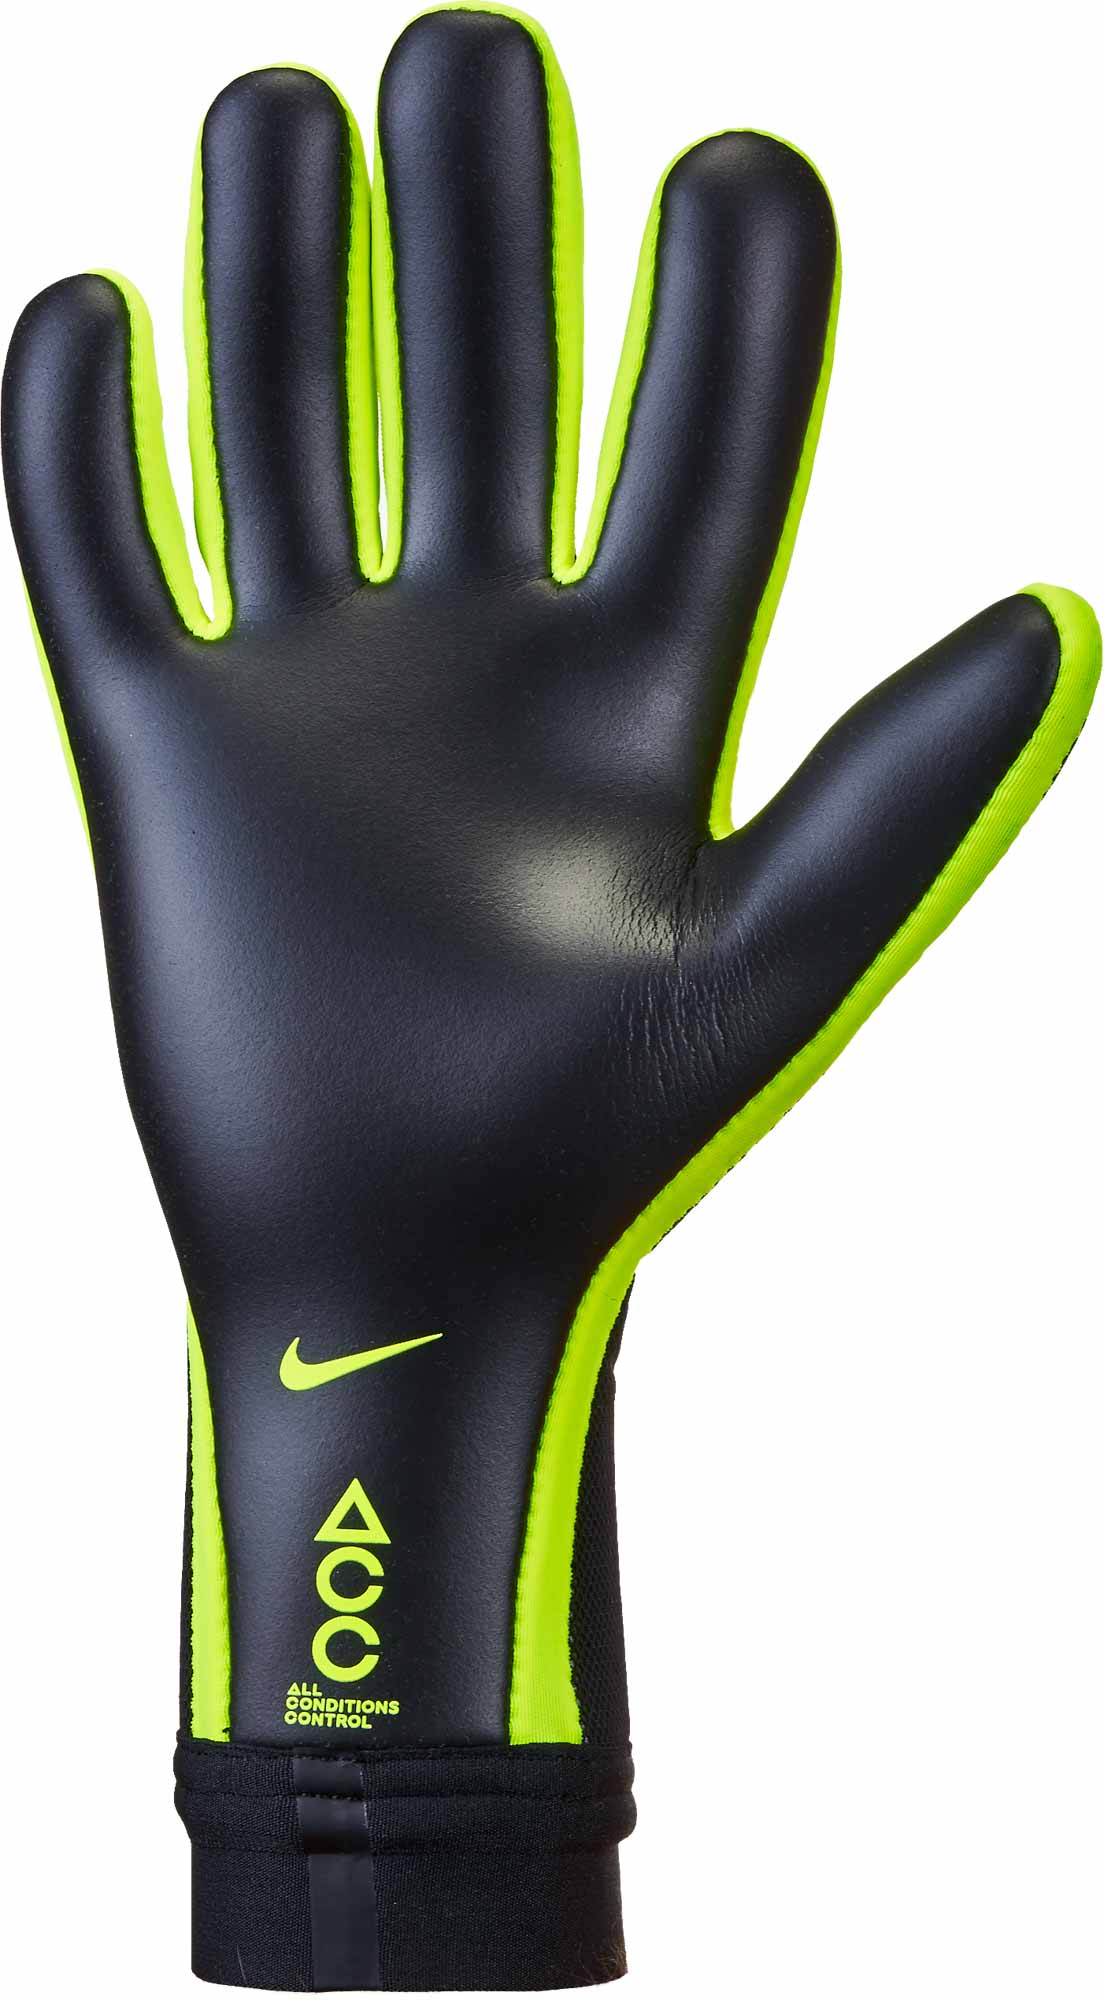 Nike Vapor Touch Goalkeeper Gloves - Black Volt - SoccerPro.com 420bf3b1014c